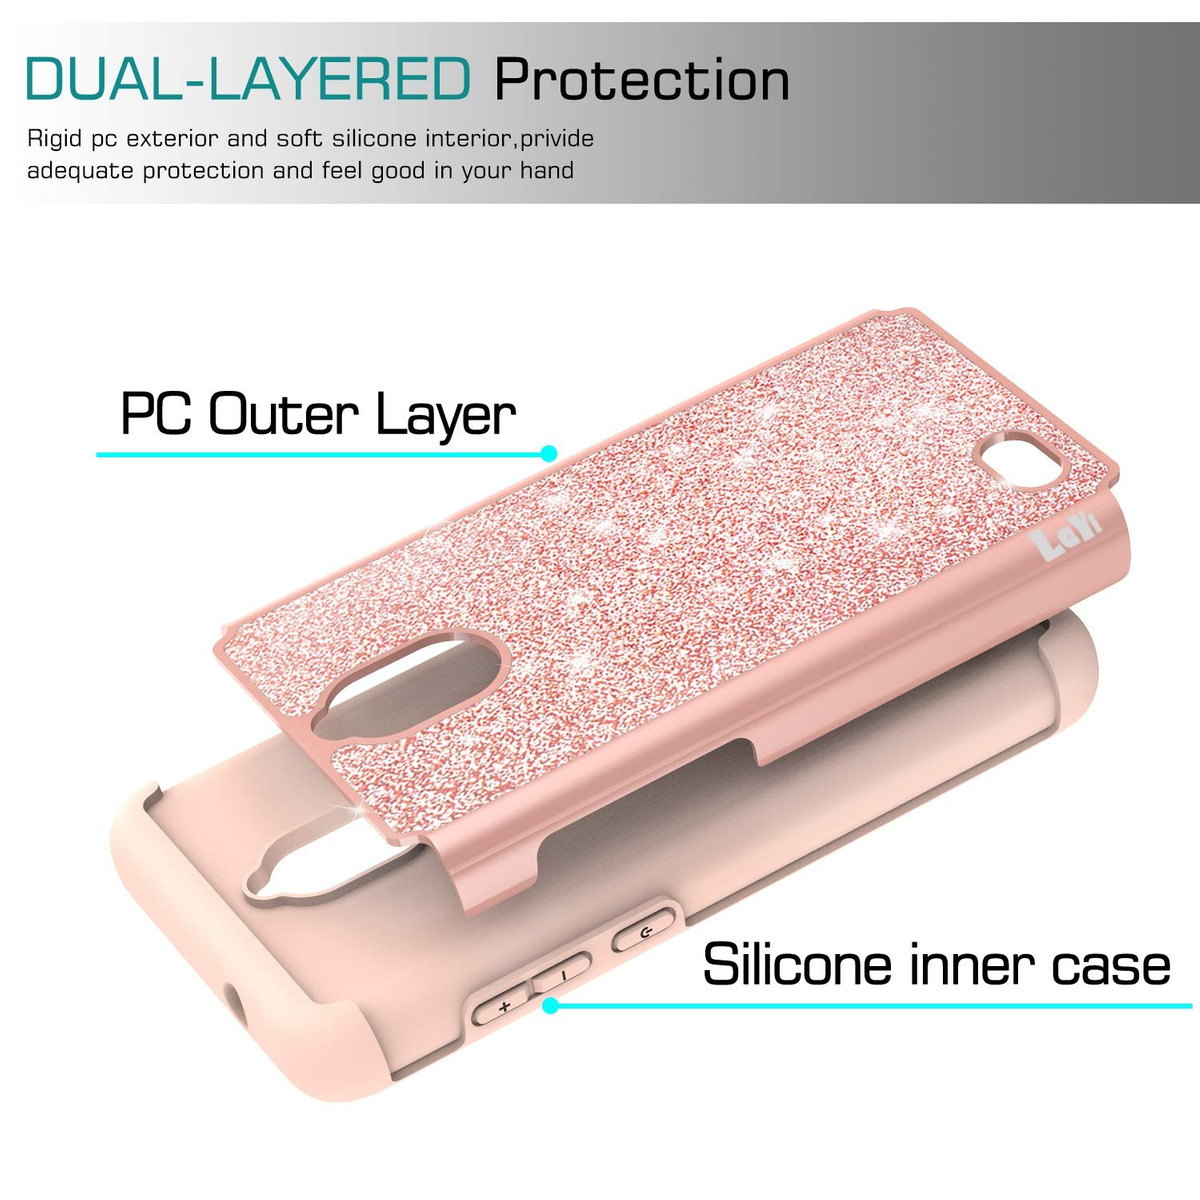 Coolpad Illumina Funda (3310a) With Hd Screen Protector For